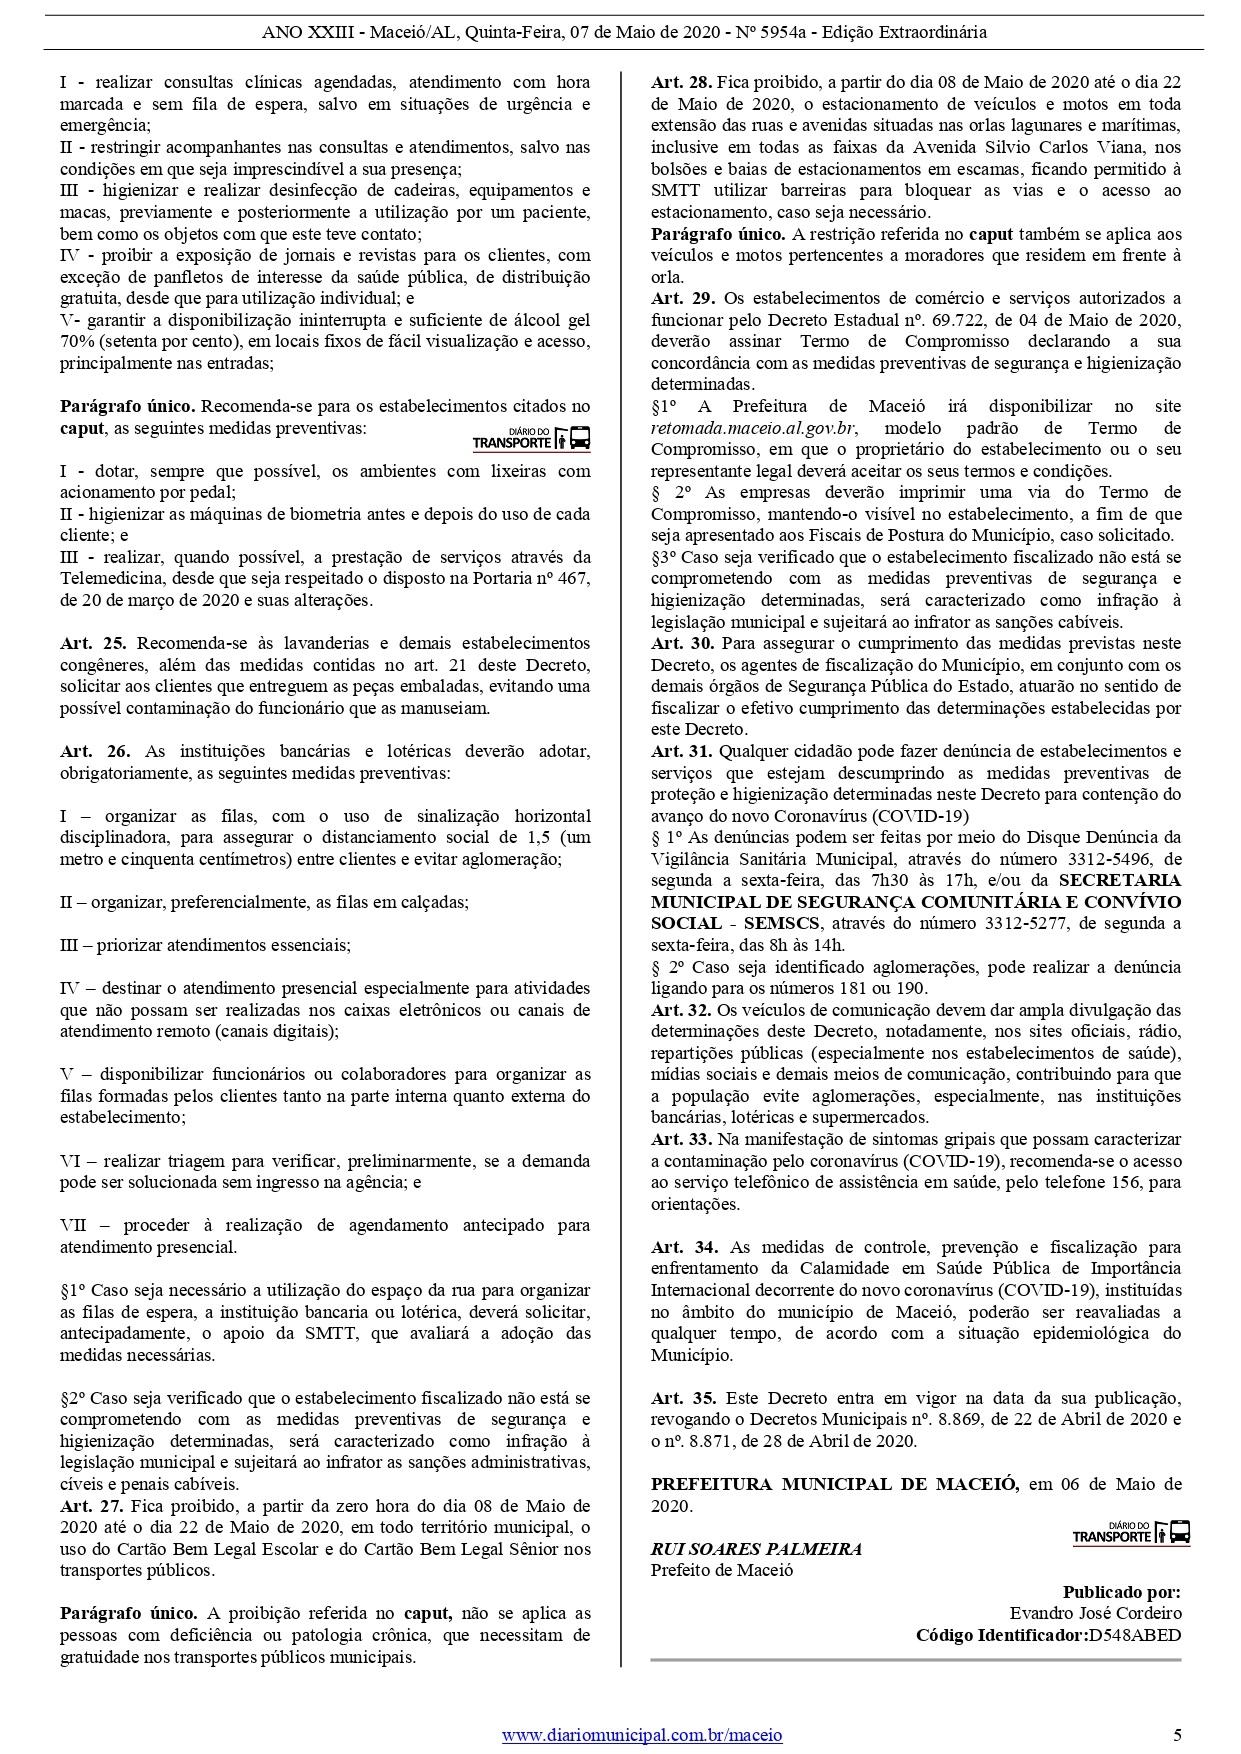 maceio_05